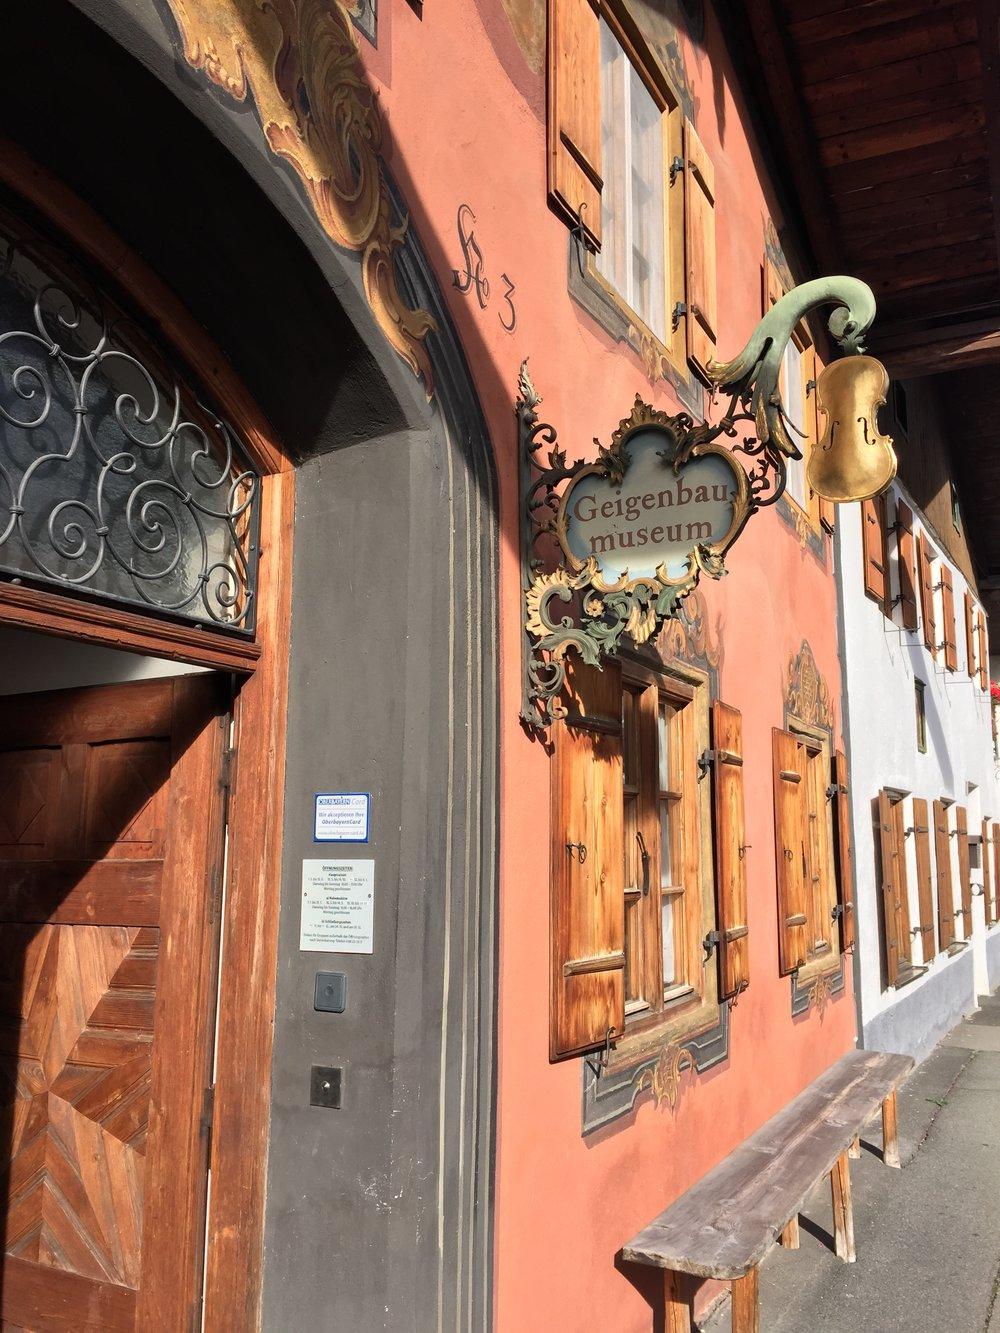 Et eget museum om feler. Geigenbau museum.